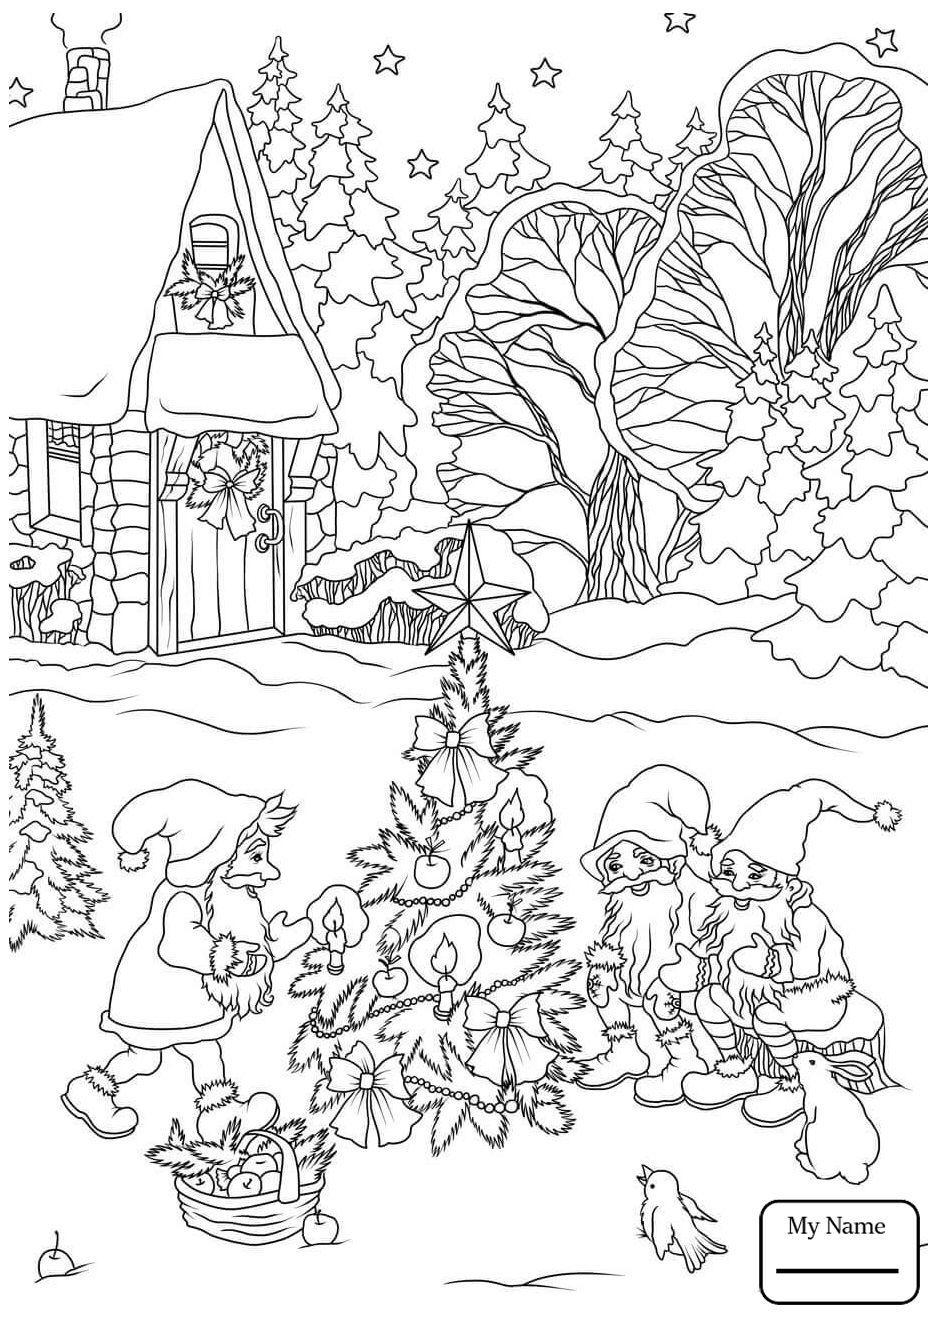 Pin oleh HappyKidsActivity di Trees Coloring Collection